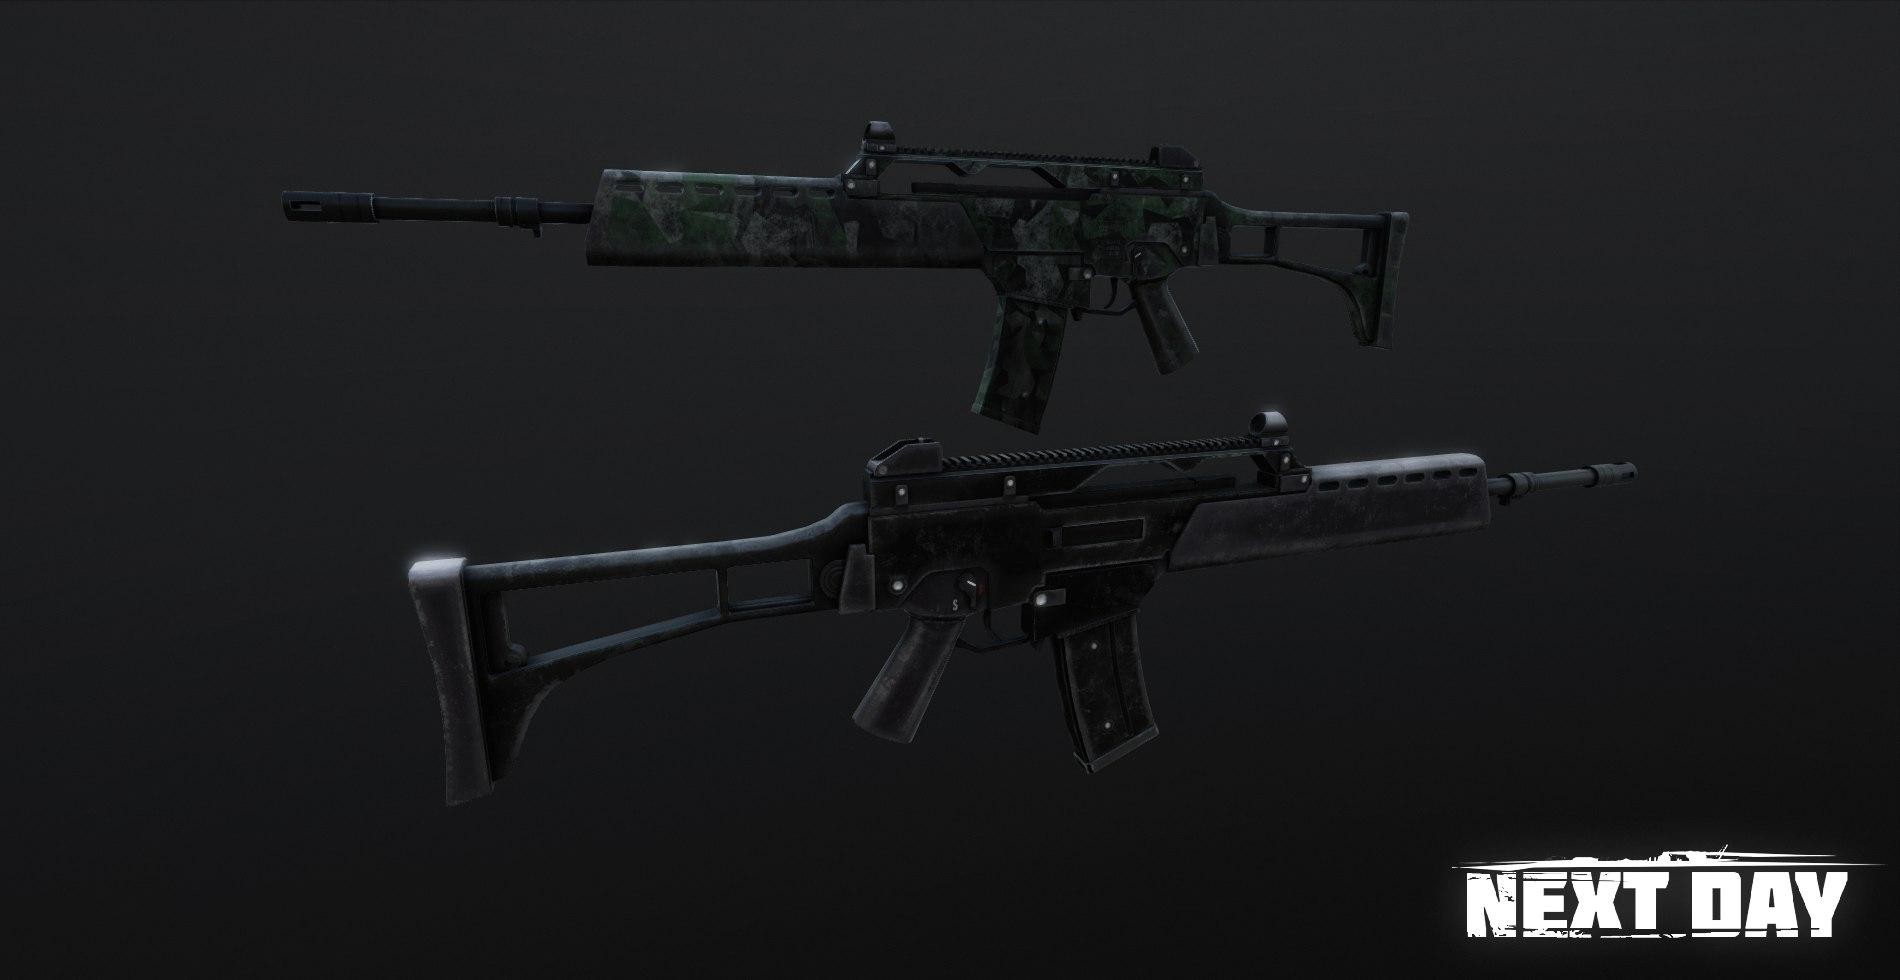 HK G36 - Next Day: Survival Оружие